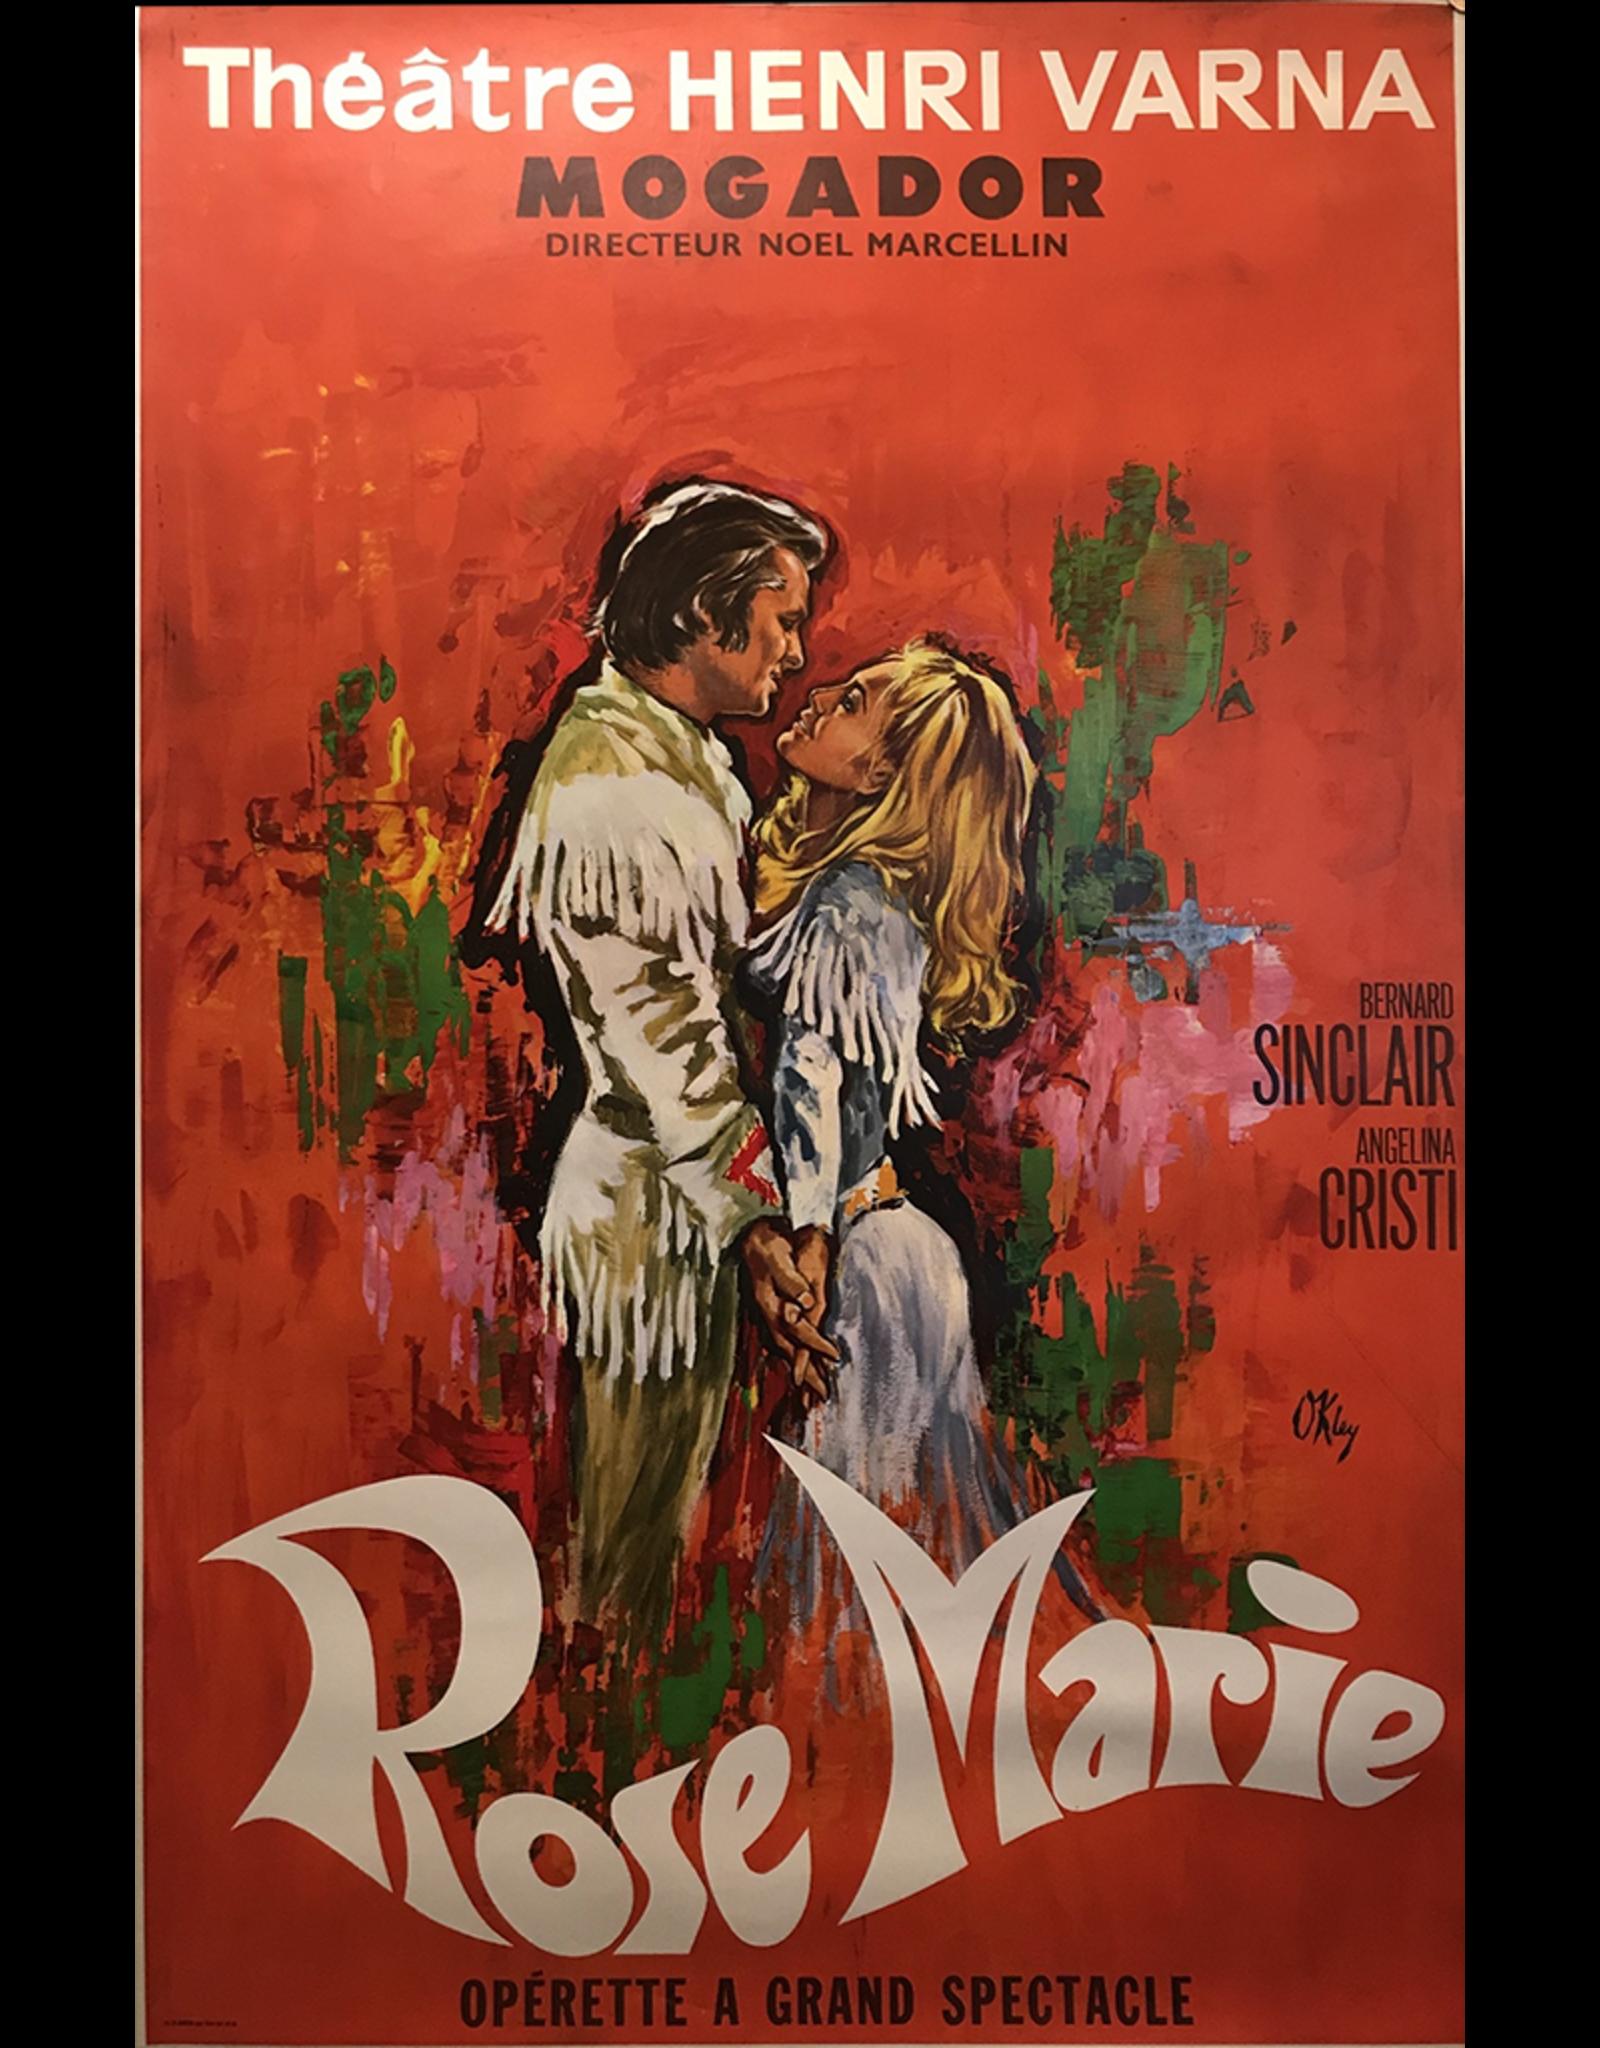 SPV Rose Marie Operette A Grand Spectacle